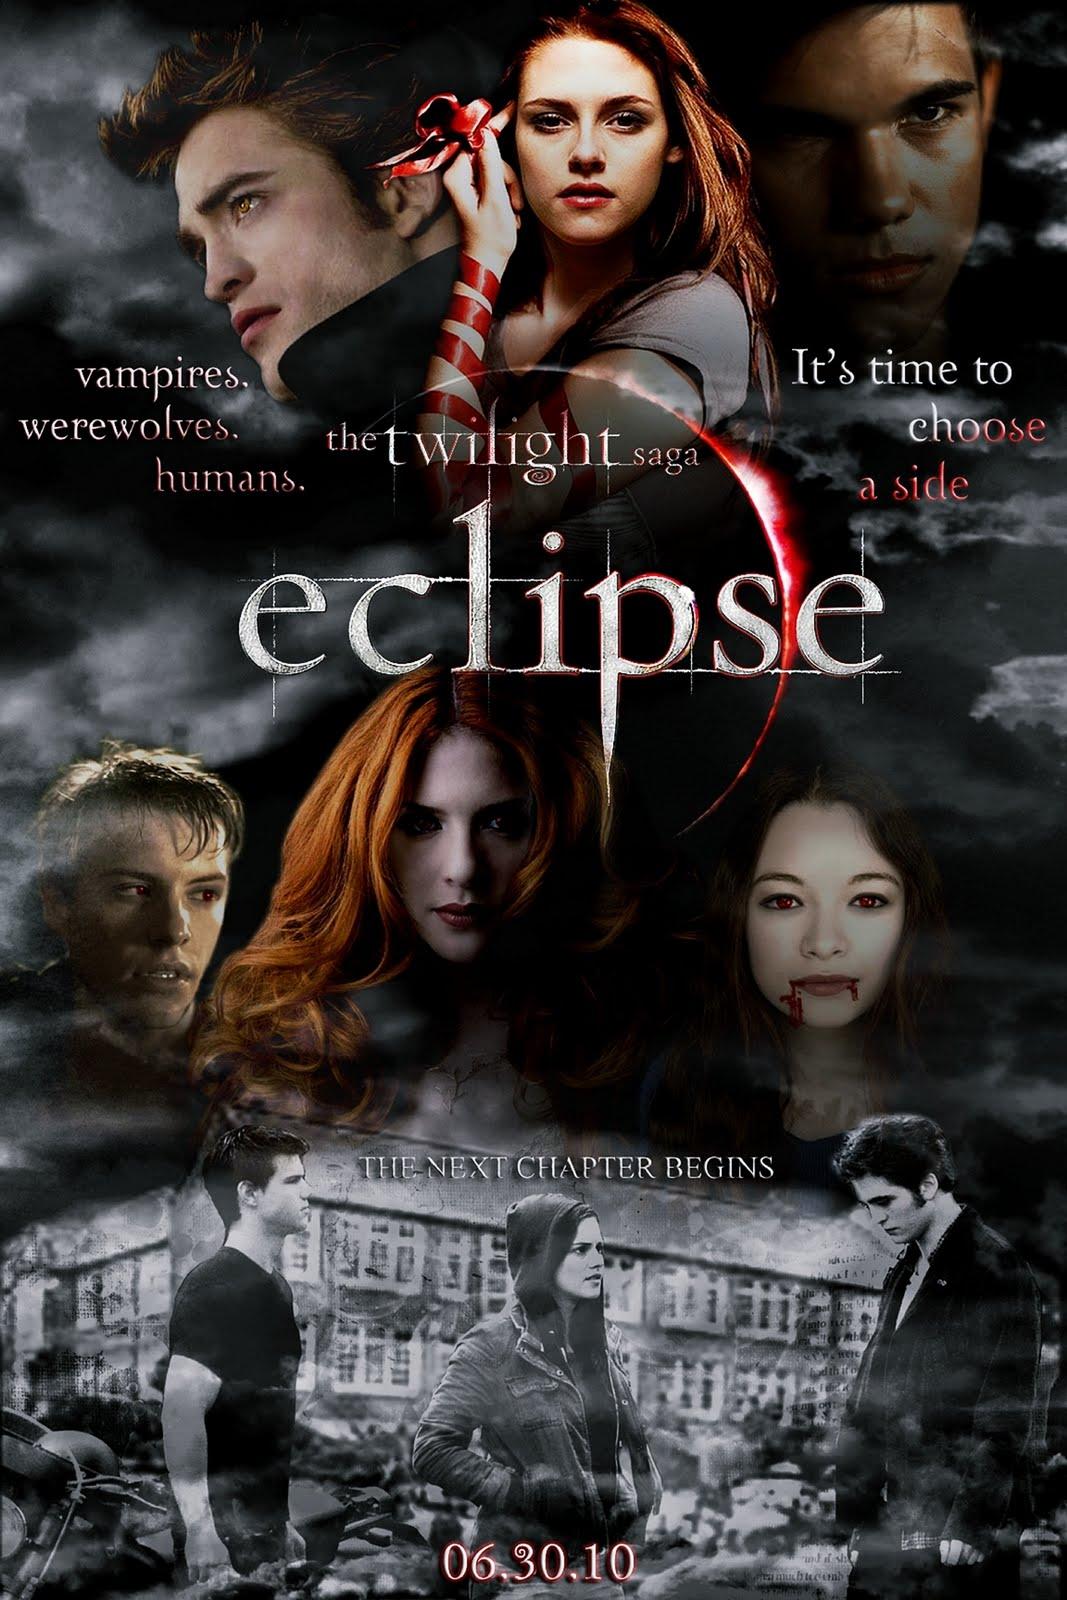 http://4.bp.blogspot.com/_0sFWB2-2XWI/TD3wU77pFfI/AAAAAAAABhM/iDhR2uwl6ac/s1600/The%20Twilight%20Saga%20Eclipse%20(2010).jpg